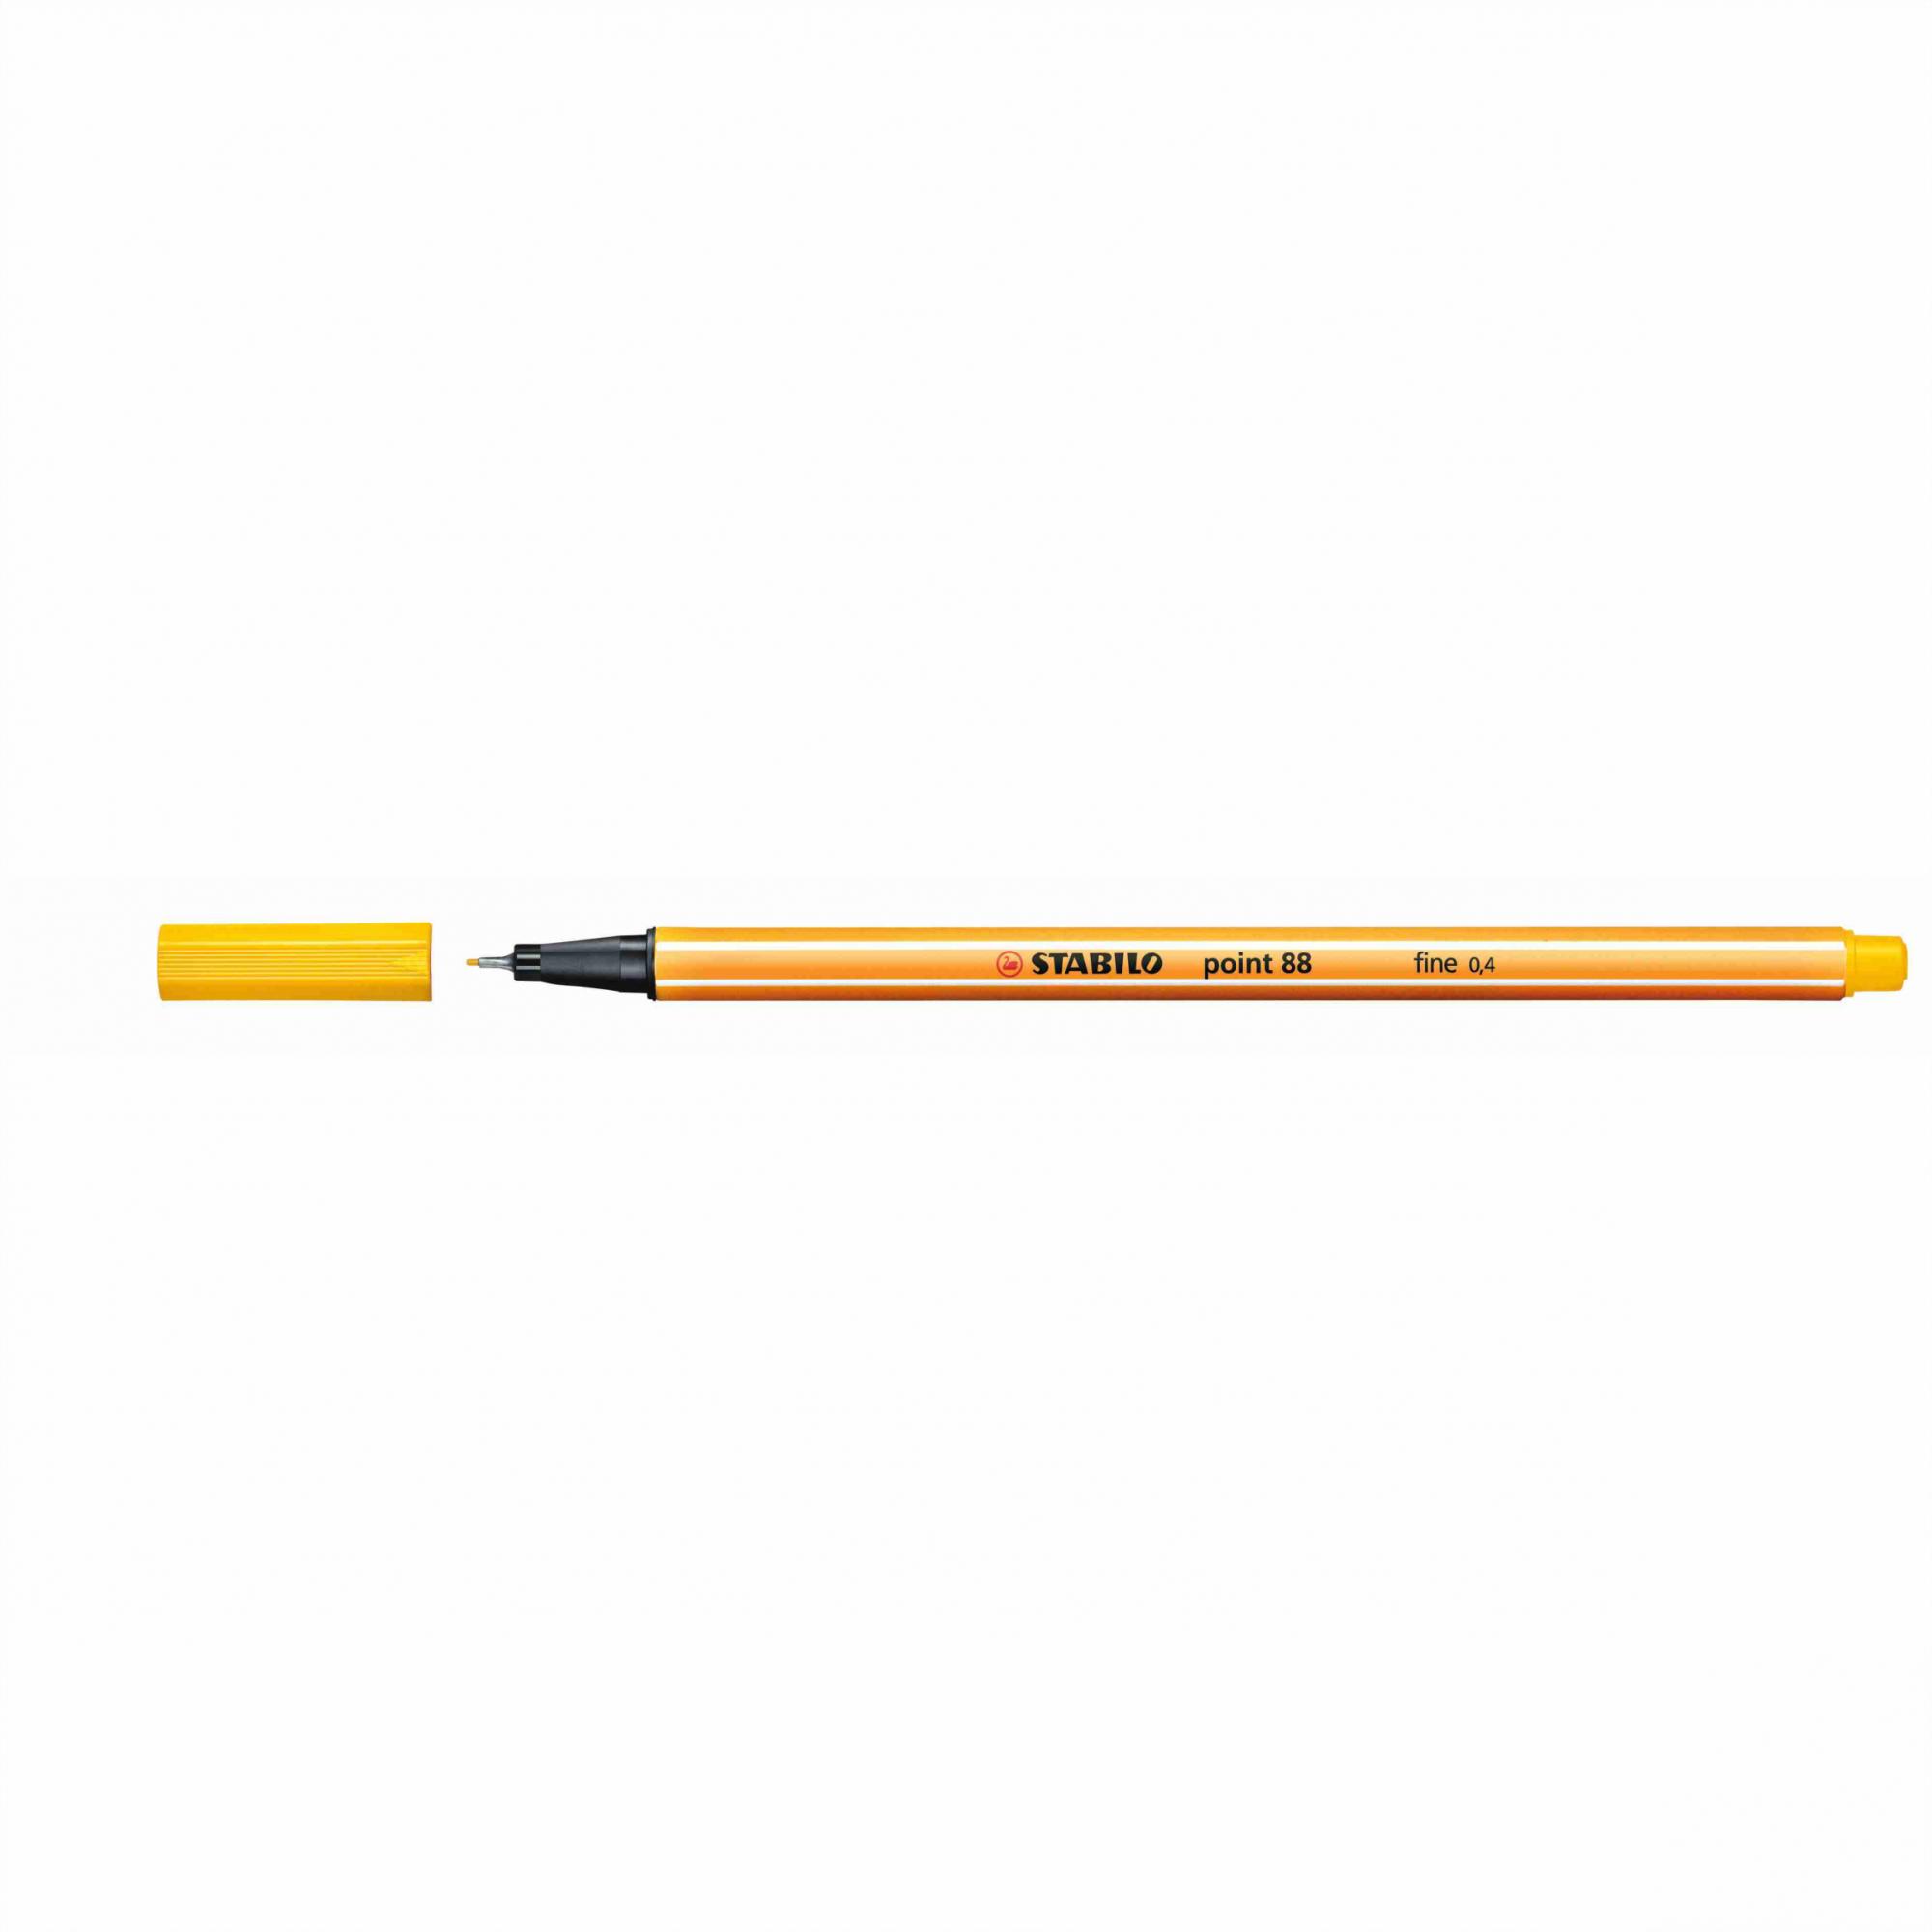 Caneta Hidrográfica 0.4 amarelo POINT 88 Stabilo